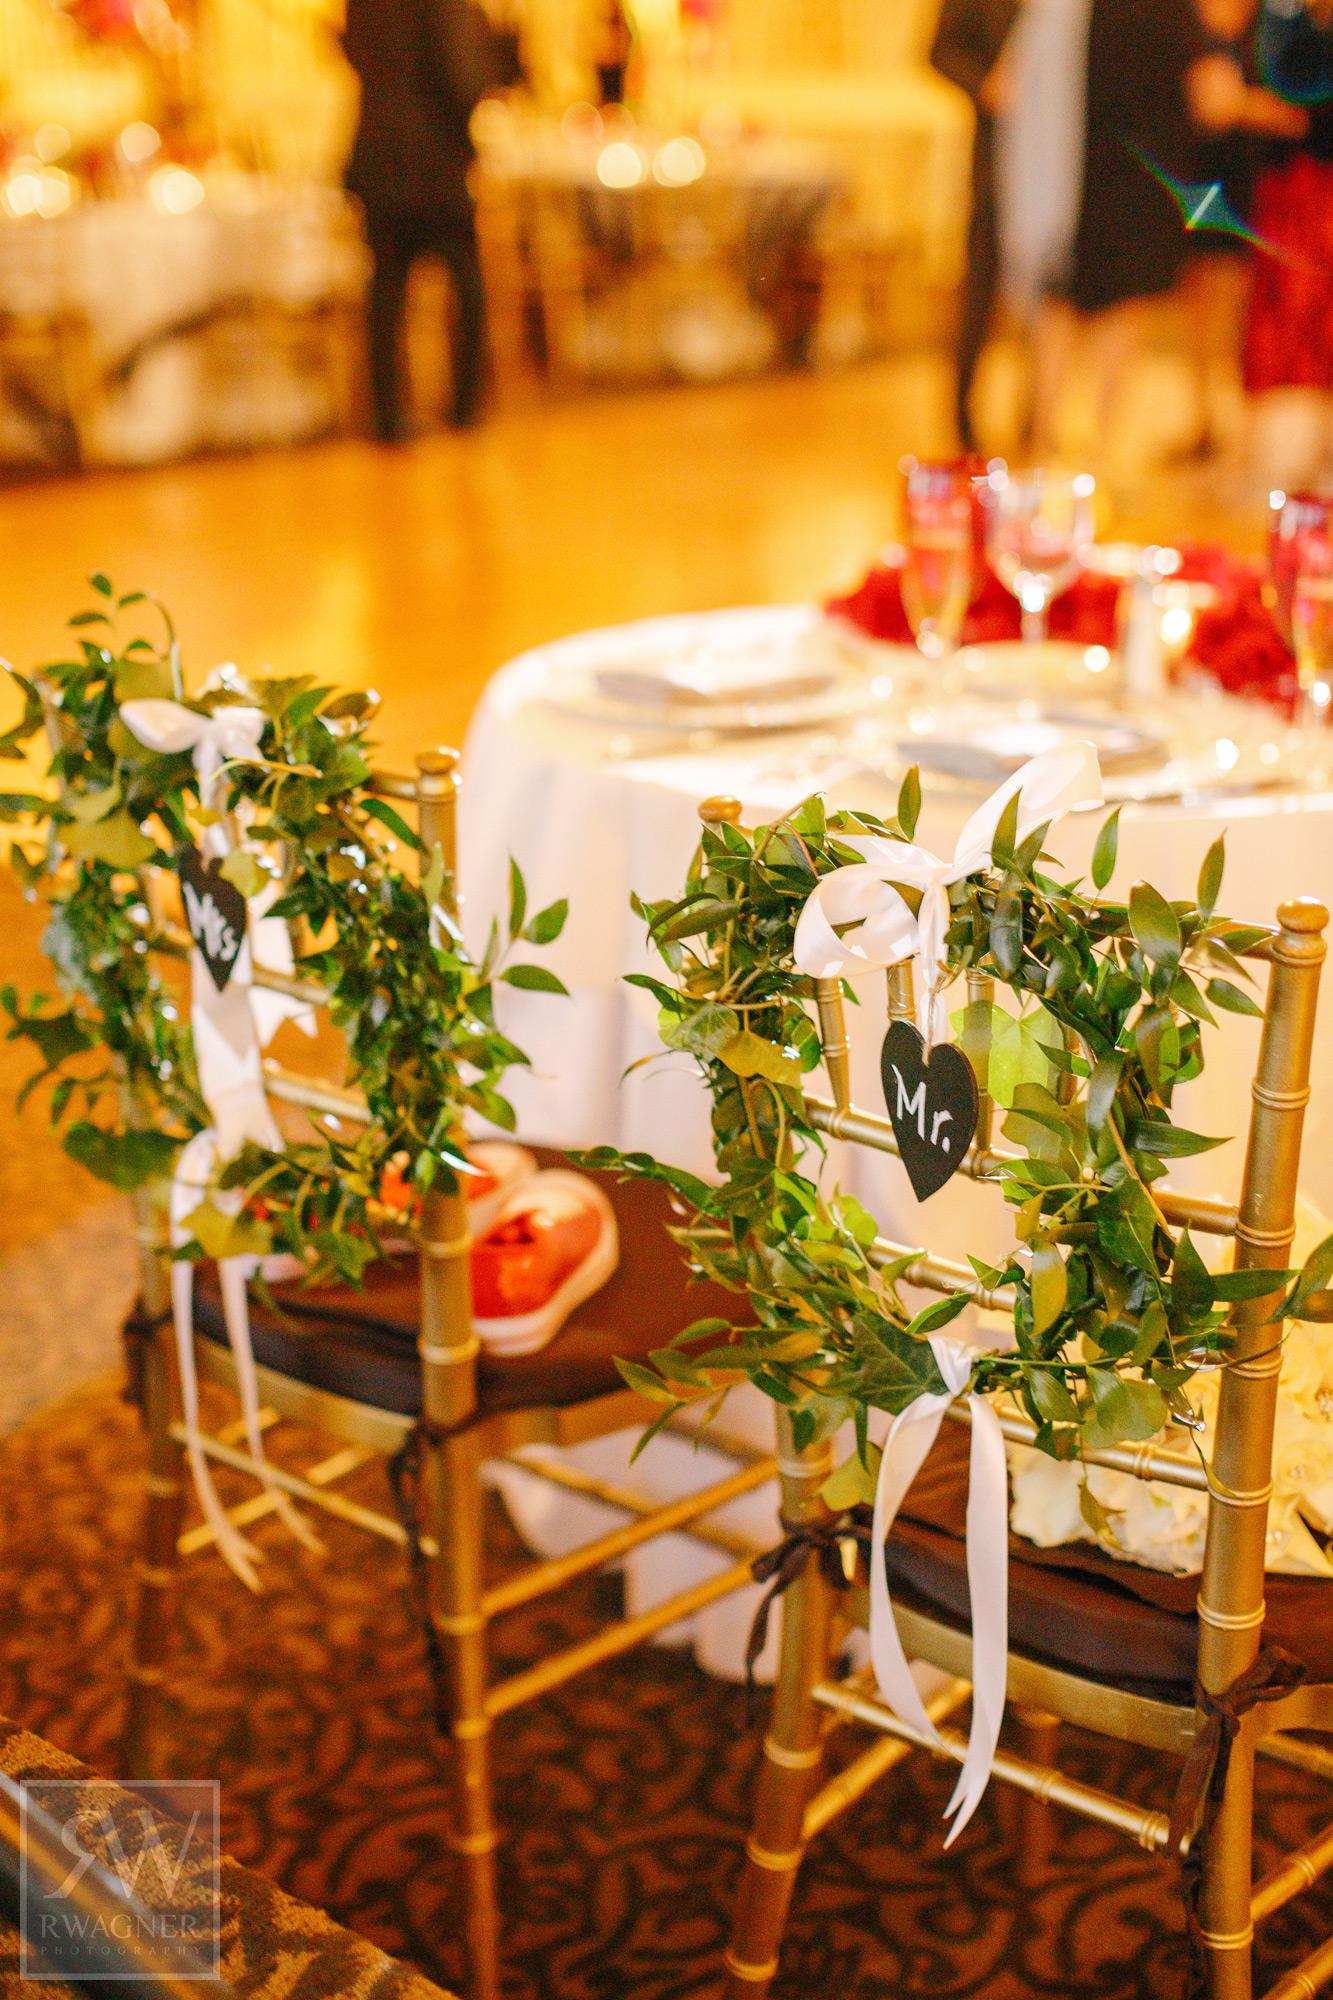 ceci_new_york_luxury_wedding_invitations_couture_red_black_white_real_wedding_dramatic_inn_at_longshore_v286_30.jpg